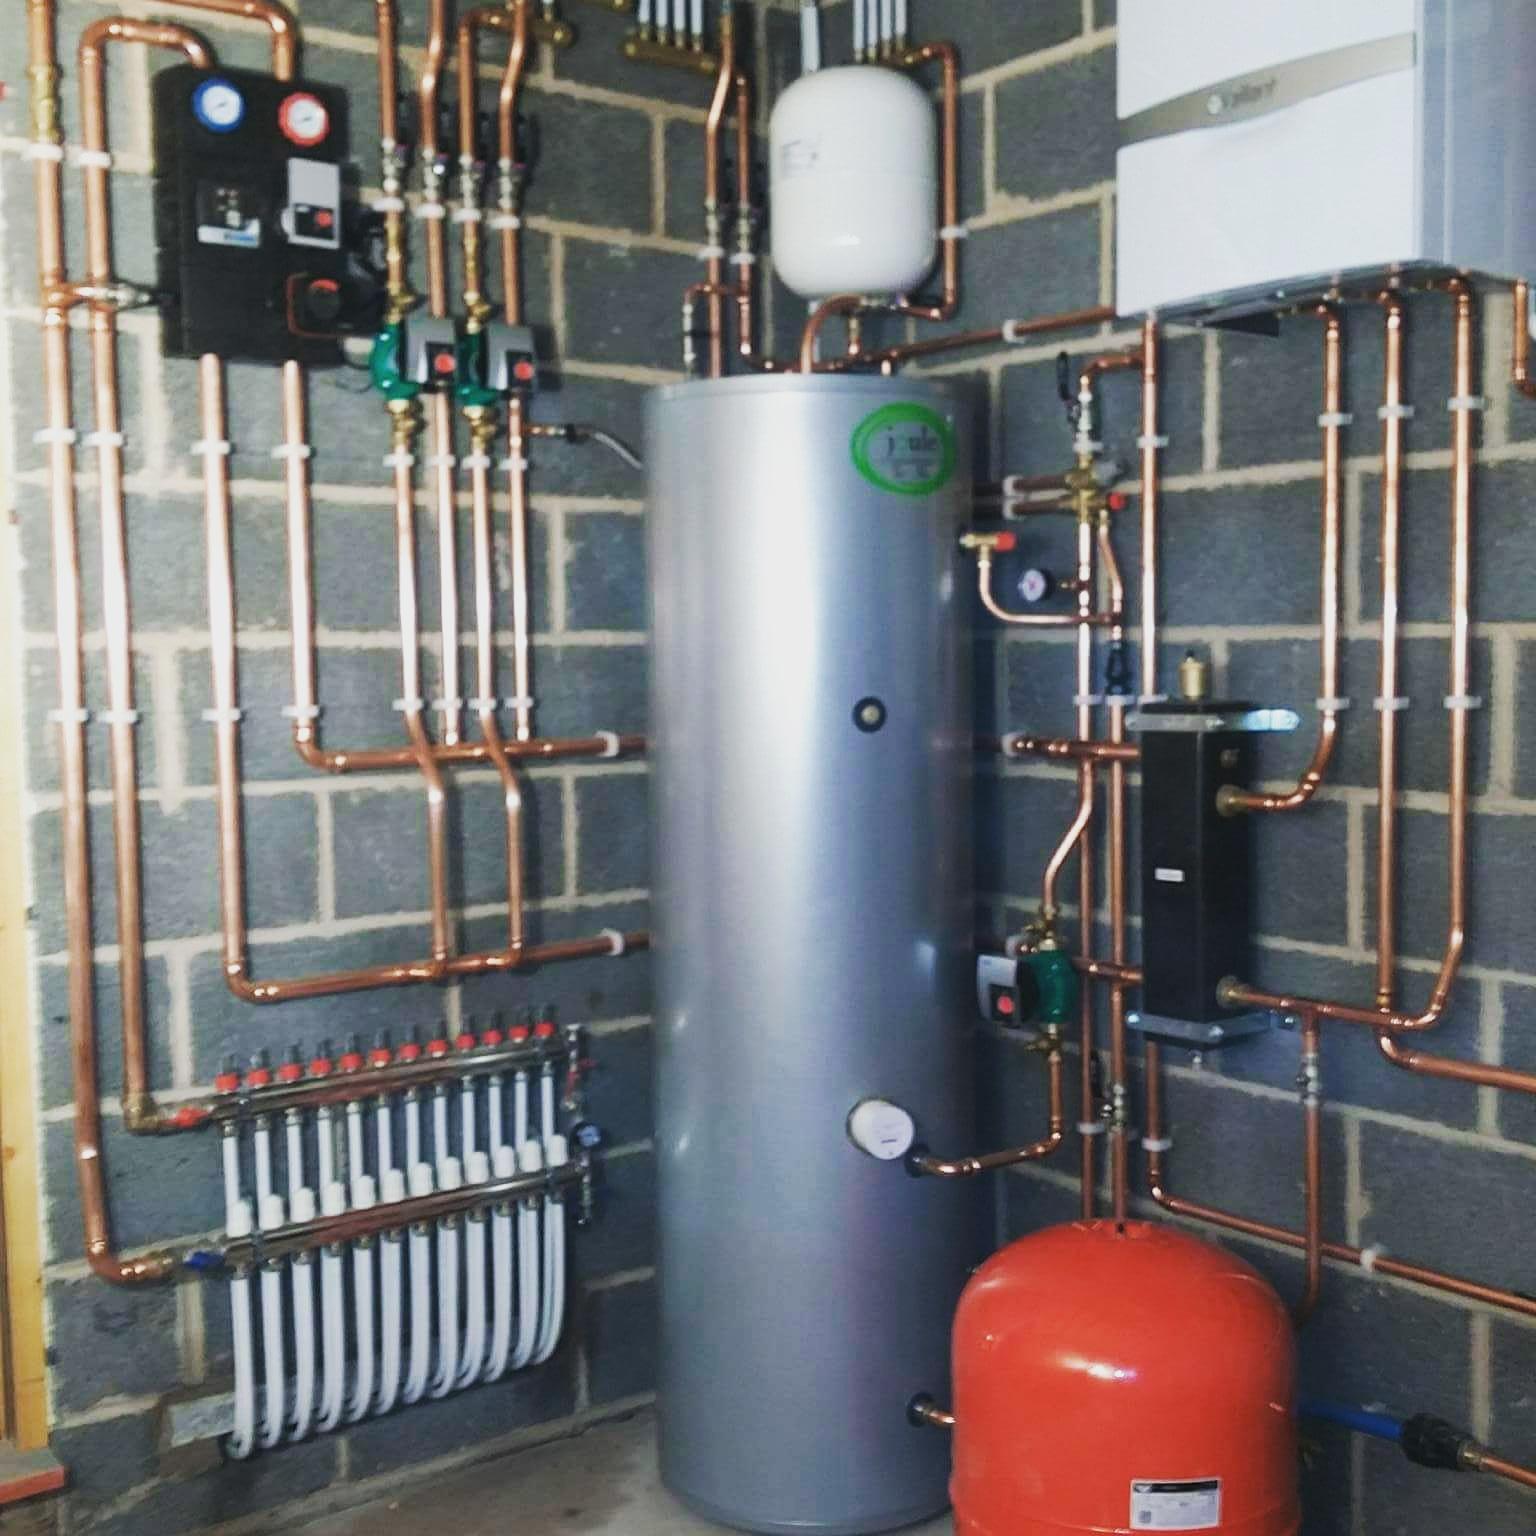 hight resolution of combi boiler underfloor heating system